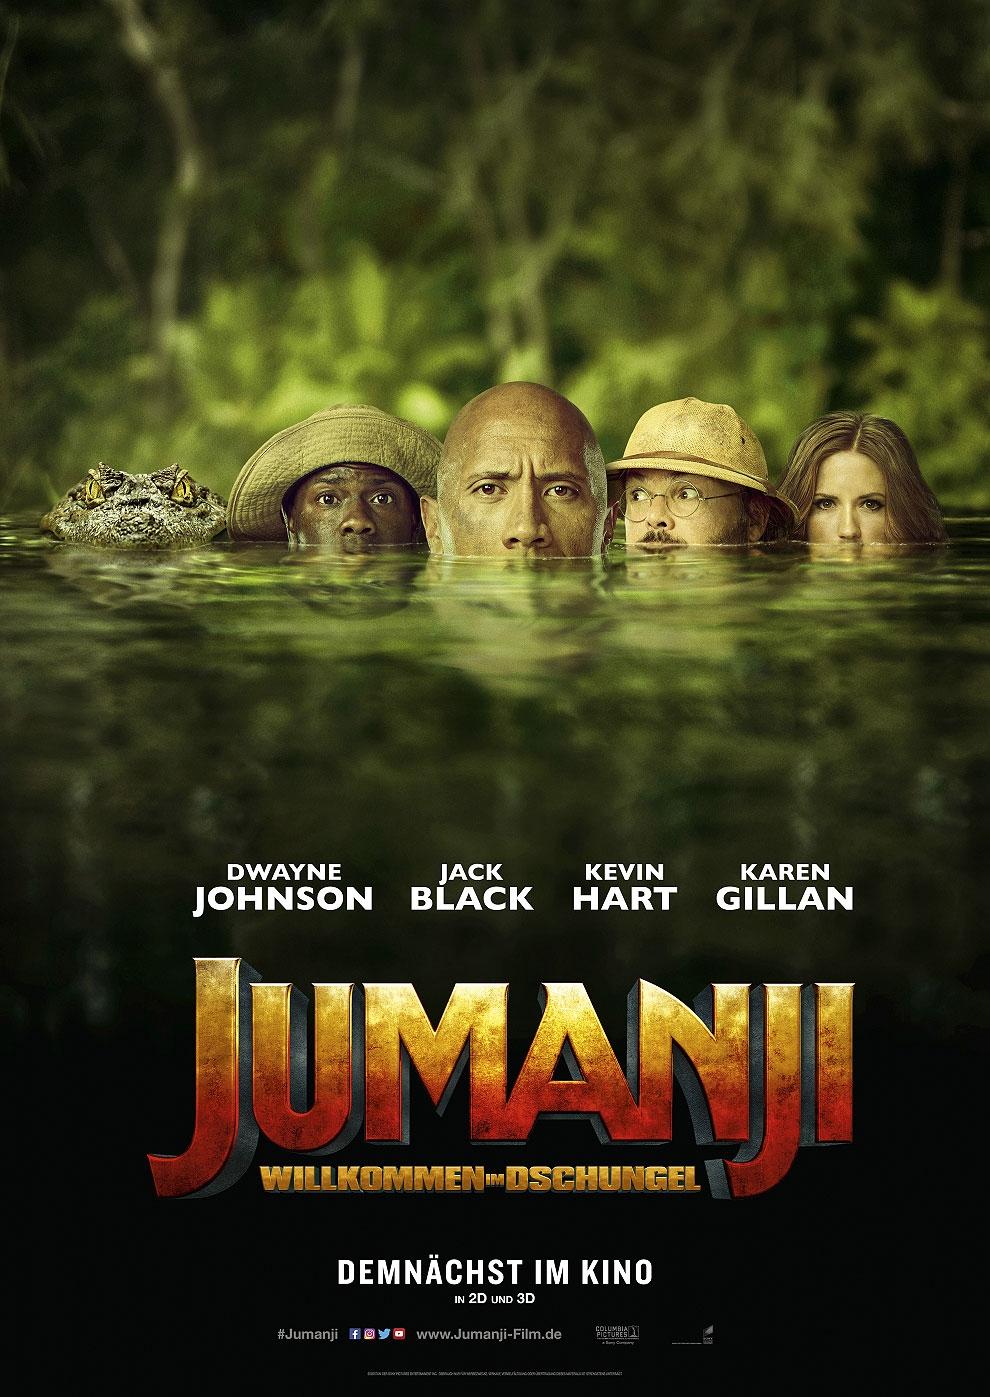 Jumanji: Willkommen im Dschungel (Poster)